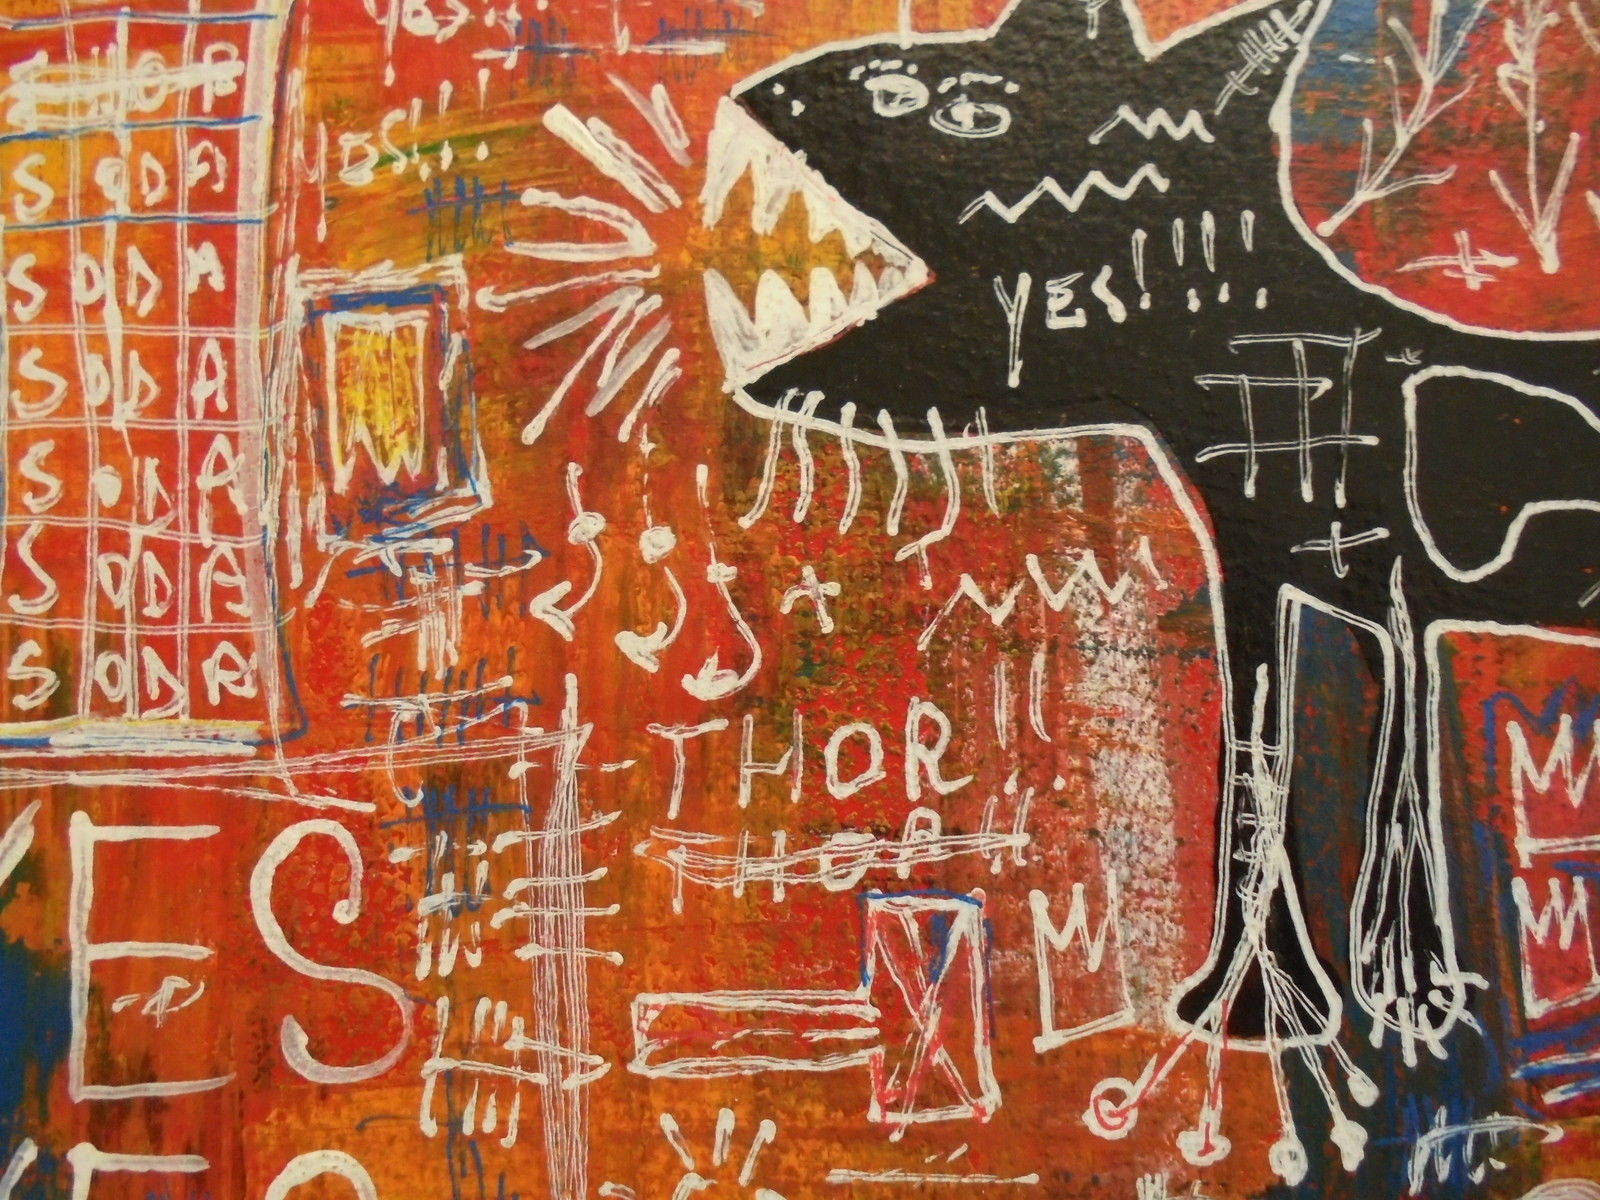 Inspirational Quotes Hd Wallpapers For Mobile Basquiat Hd Wallpaper Pixelstalk Net